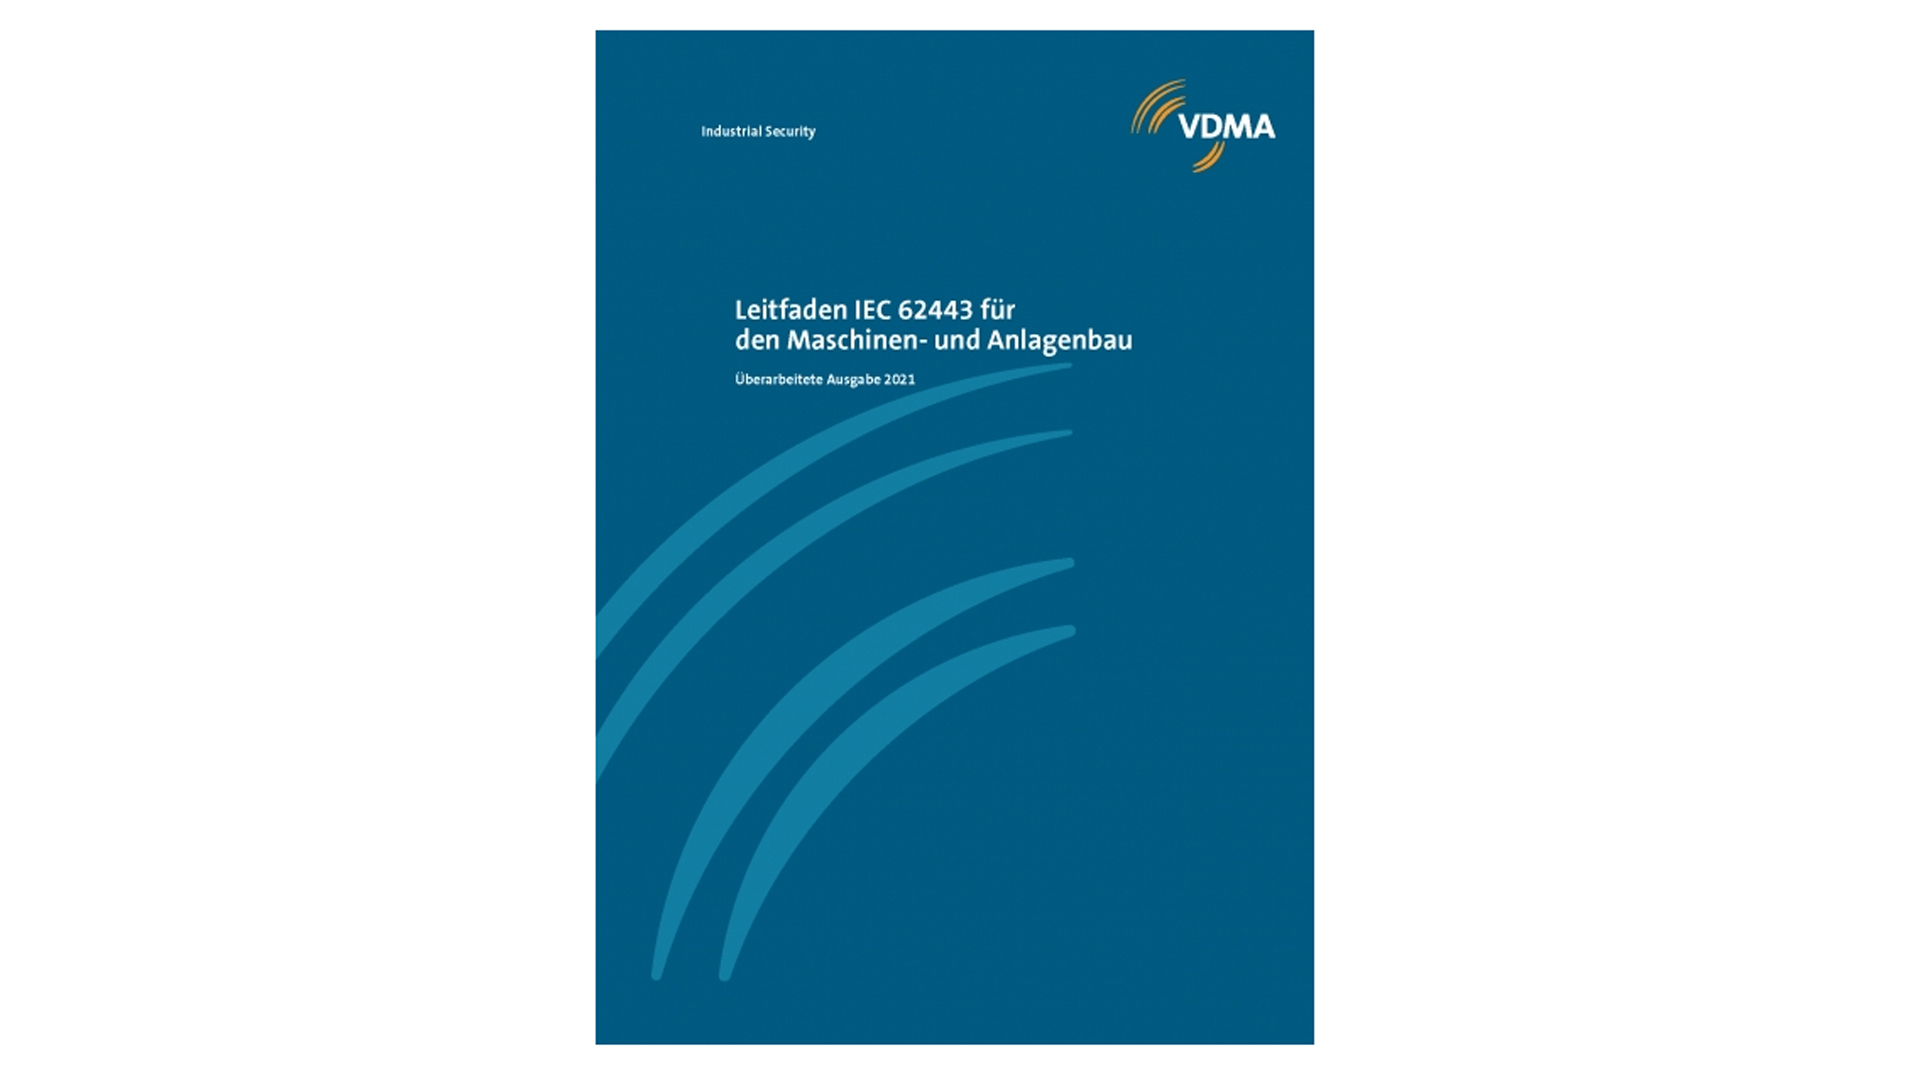 VDMA veröffentlicht Security-Leitfaden